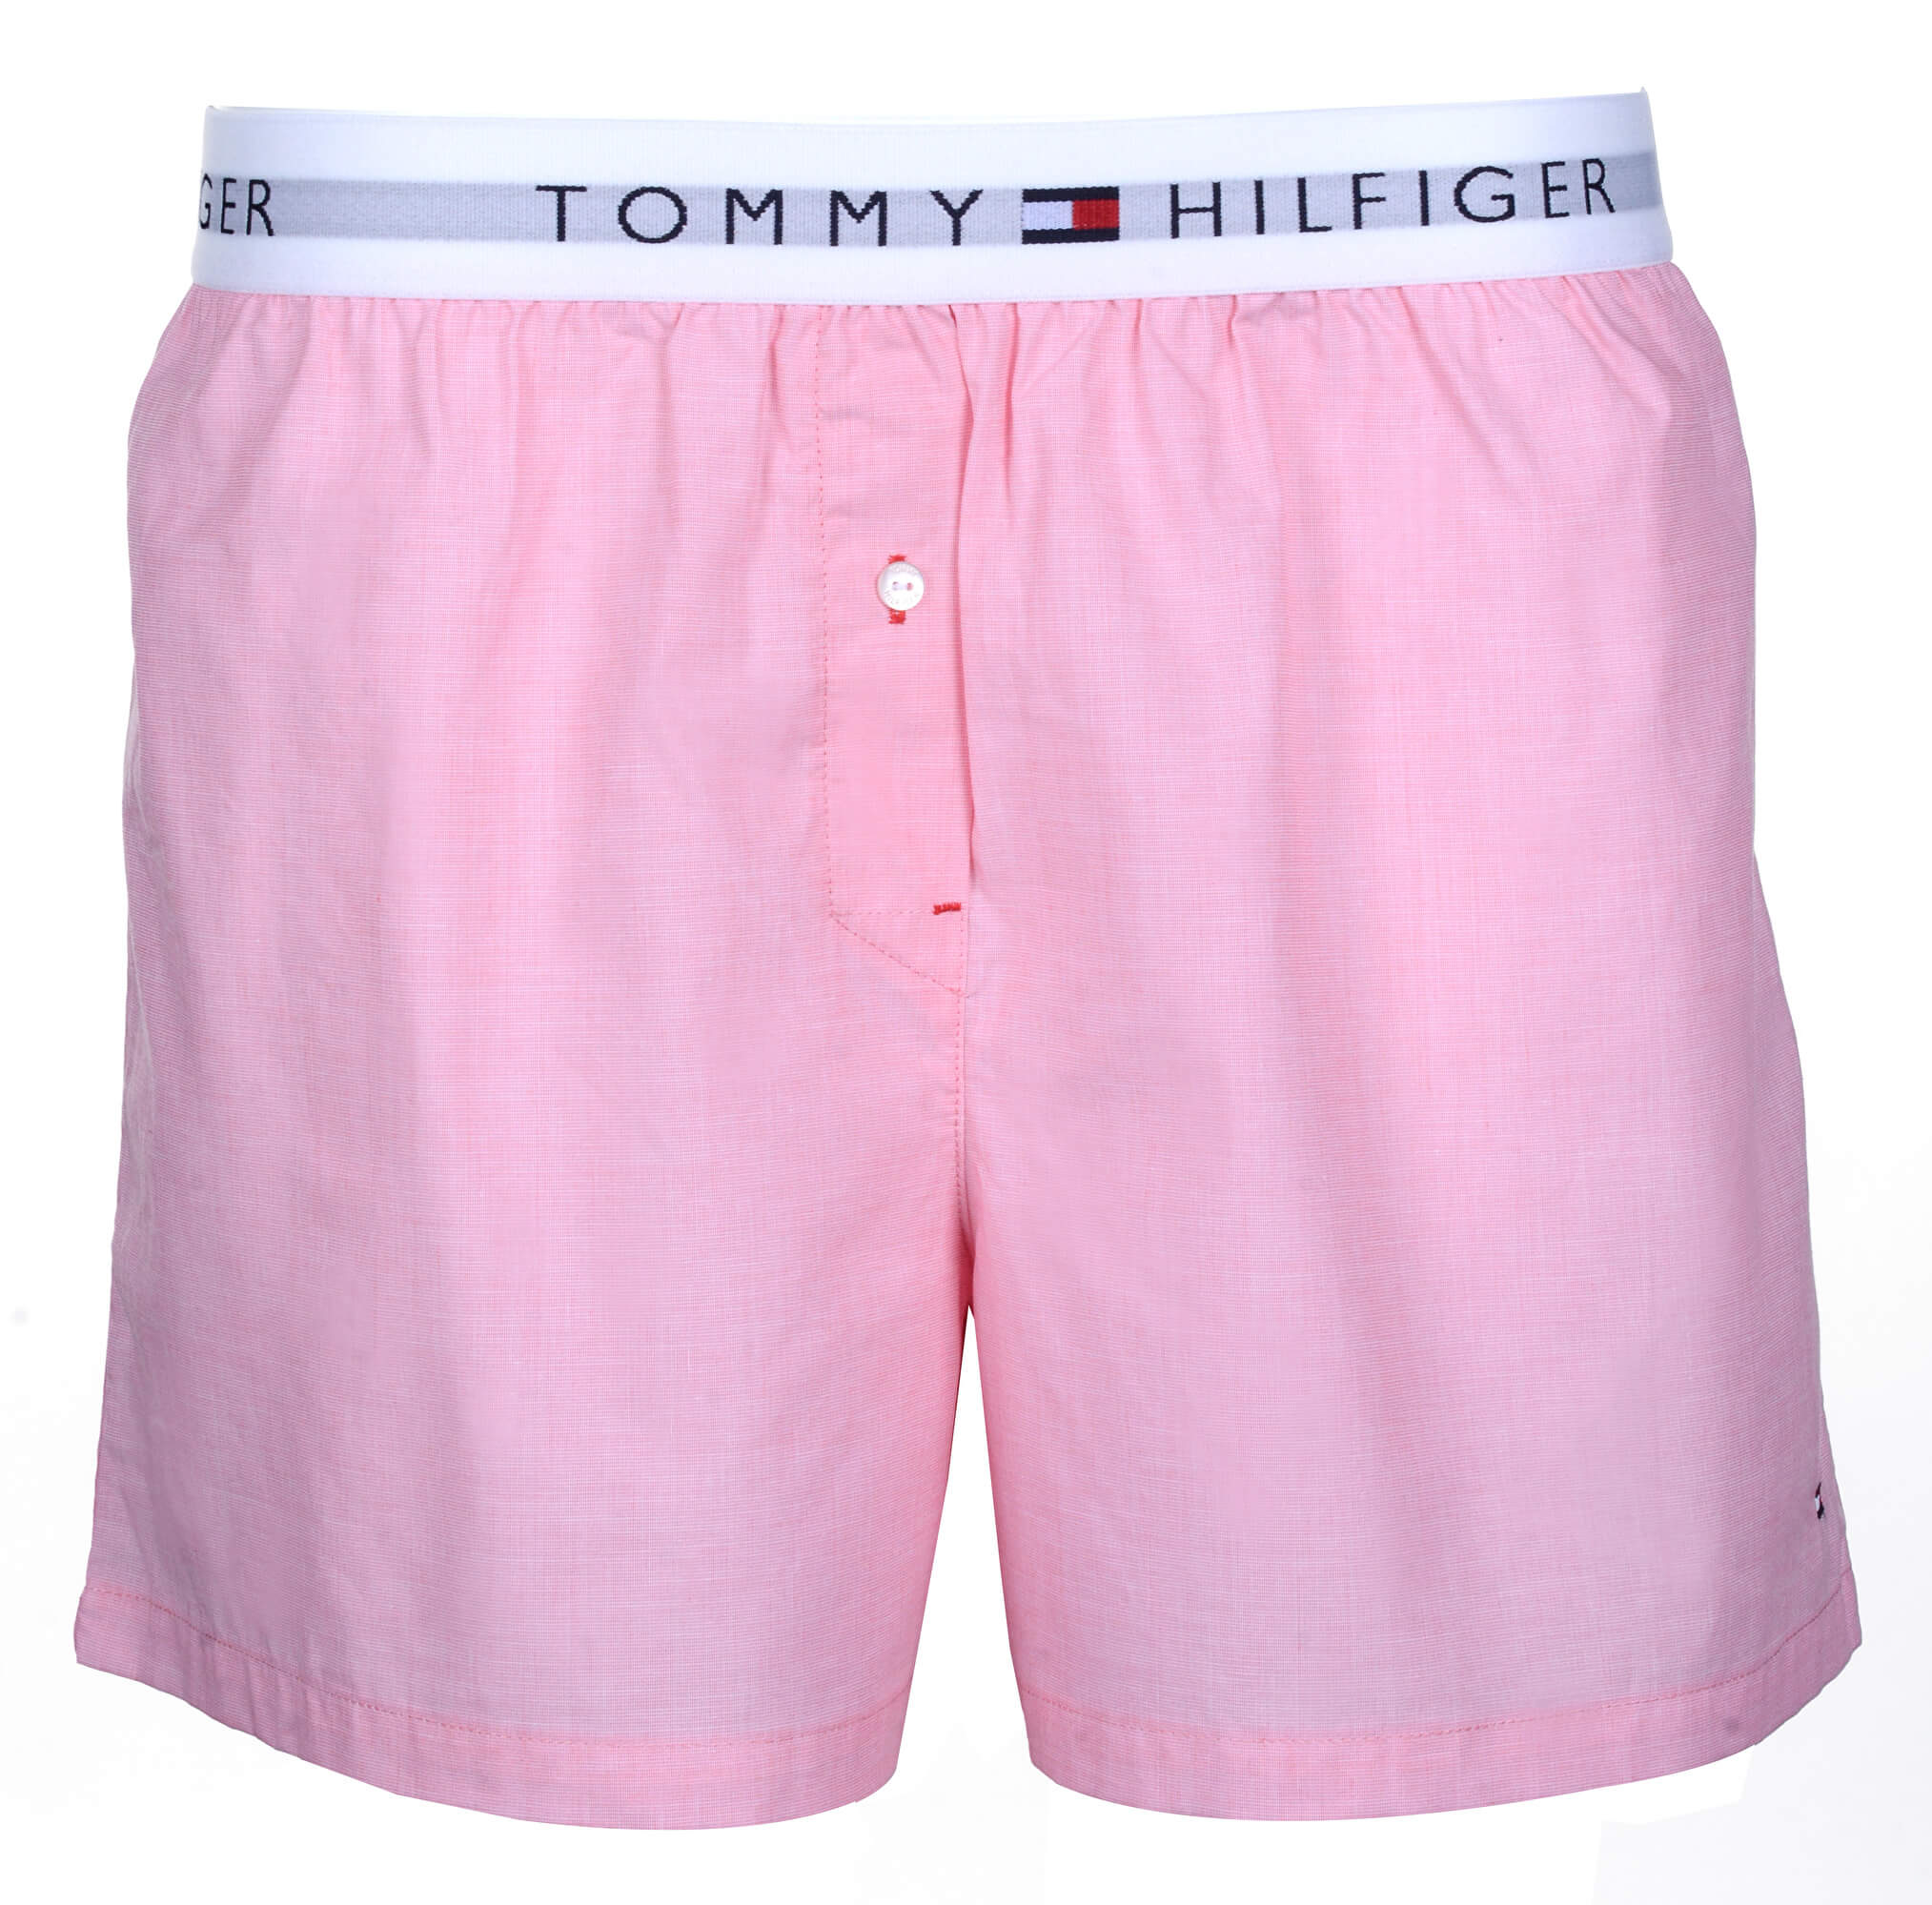 Tommy Hilfiger Dámské boxerky Woven Boxer End On End Calypso Coral  UW0UW00691-662 eb9628eddc